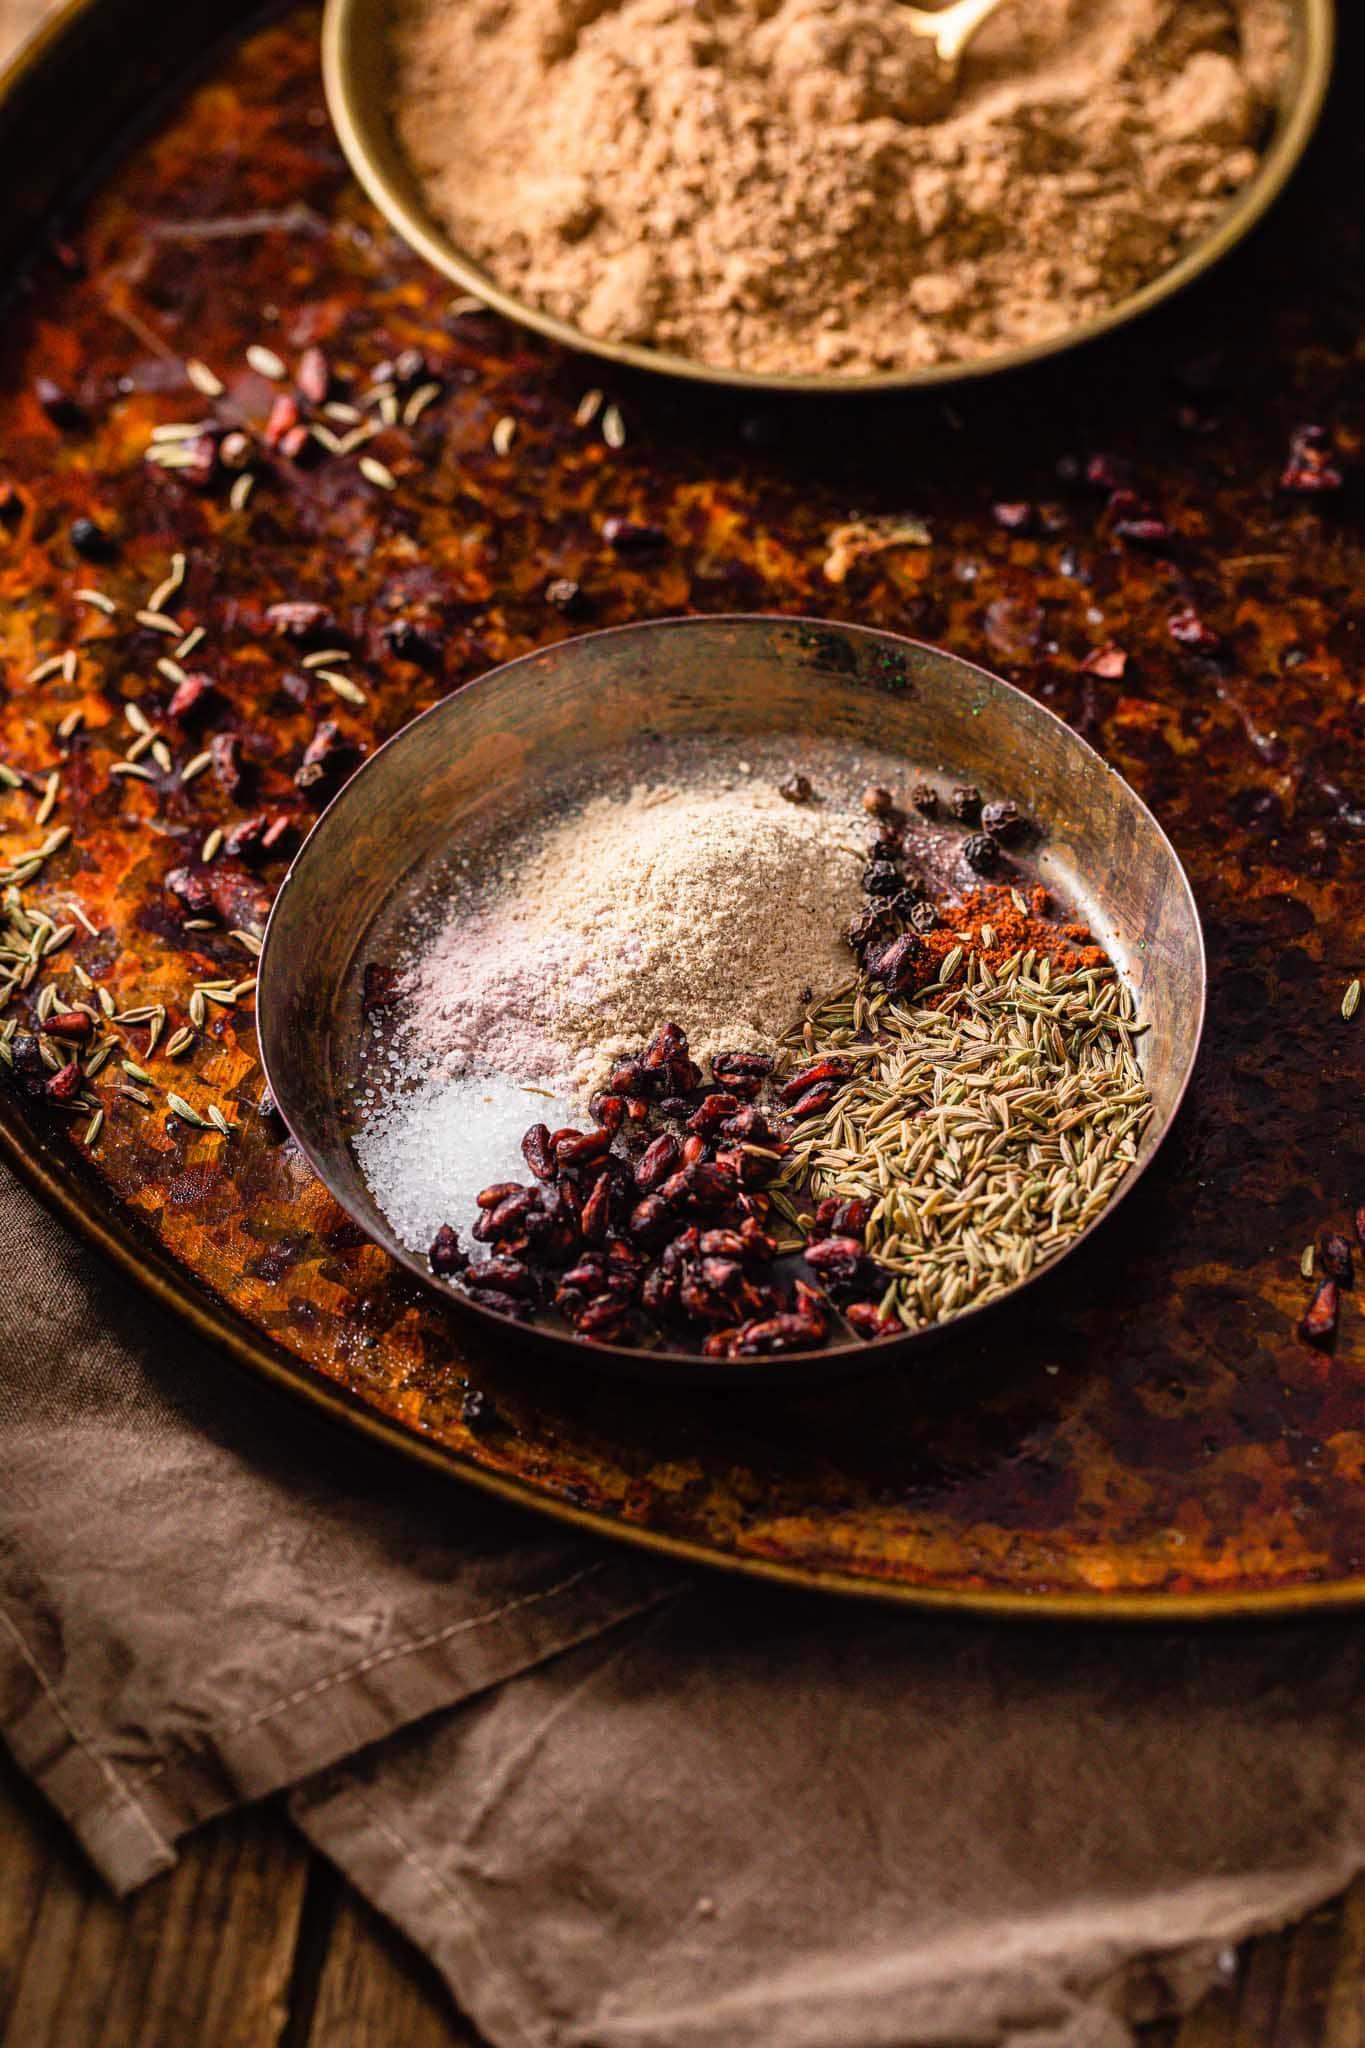 A brass bowl containing dried mango powder (amchur), dried pomegranate seeds (anardana), cumin seeds, black peppercorns, red chili powder, and sugar